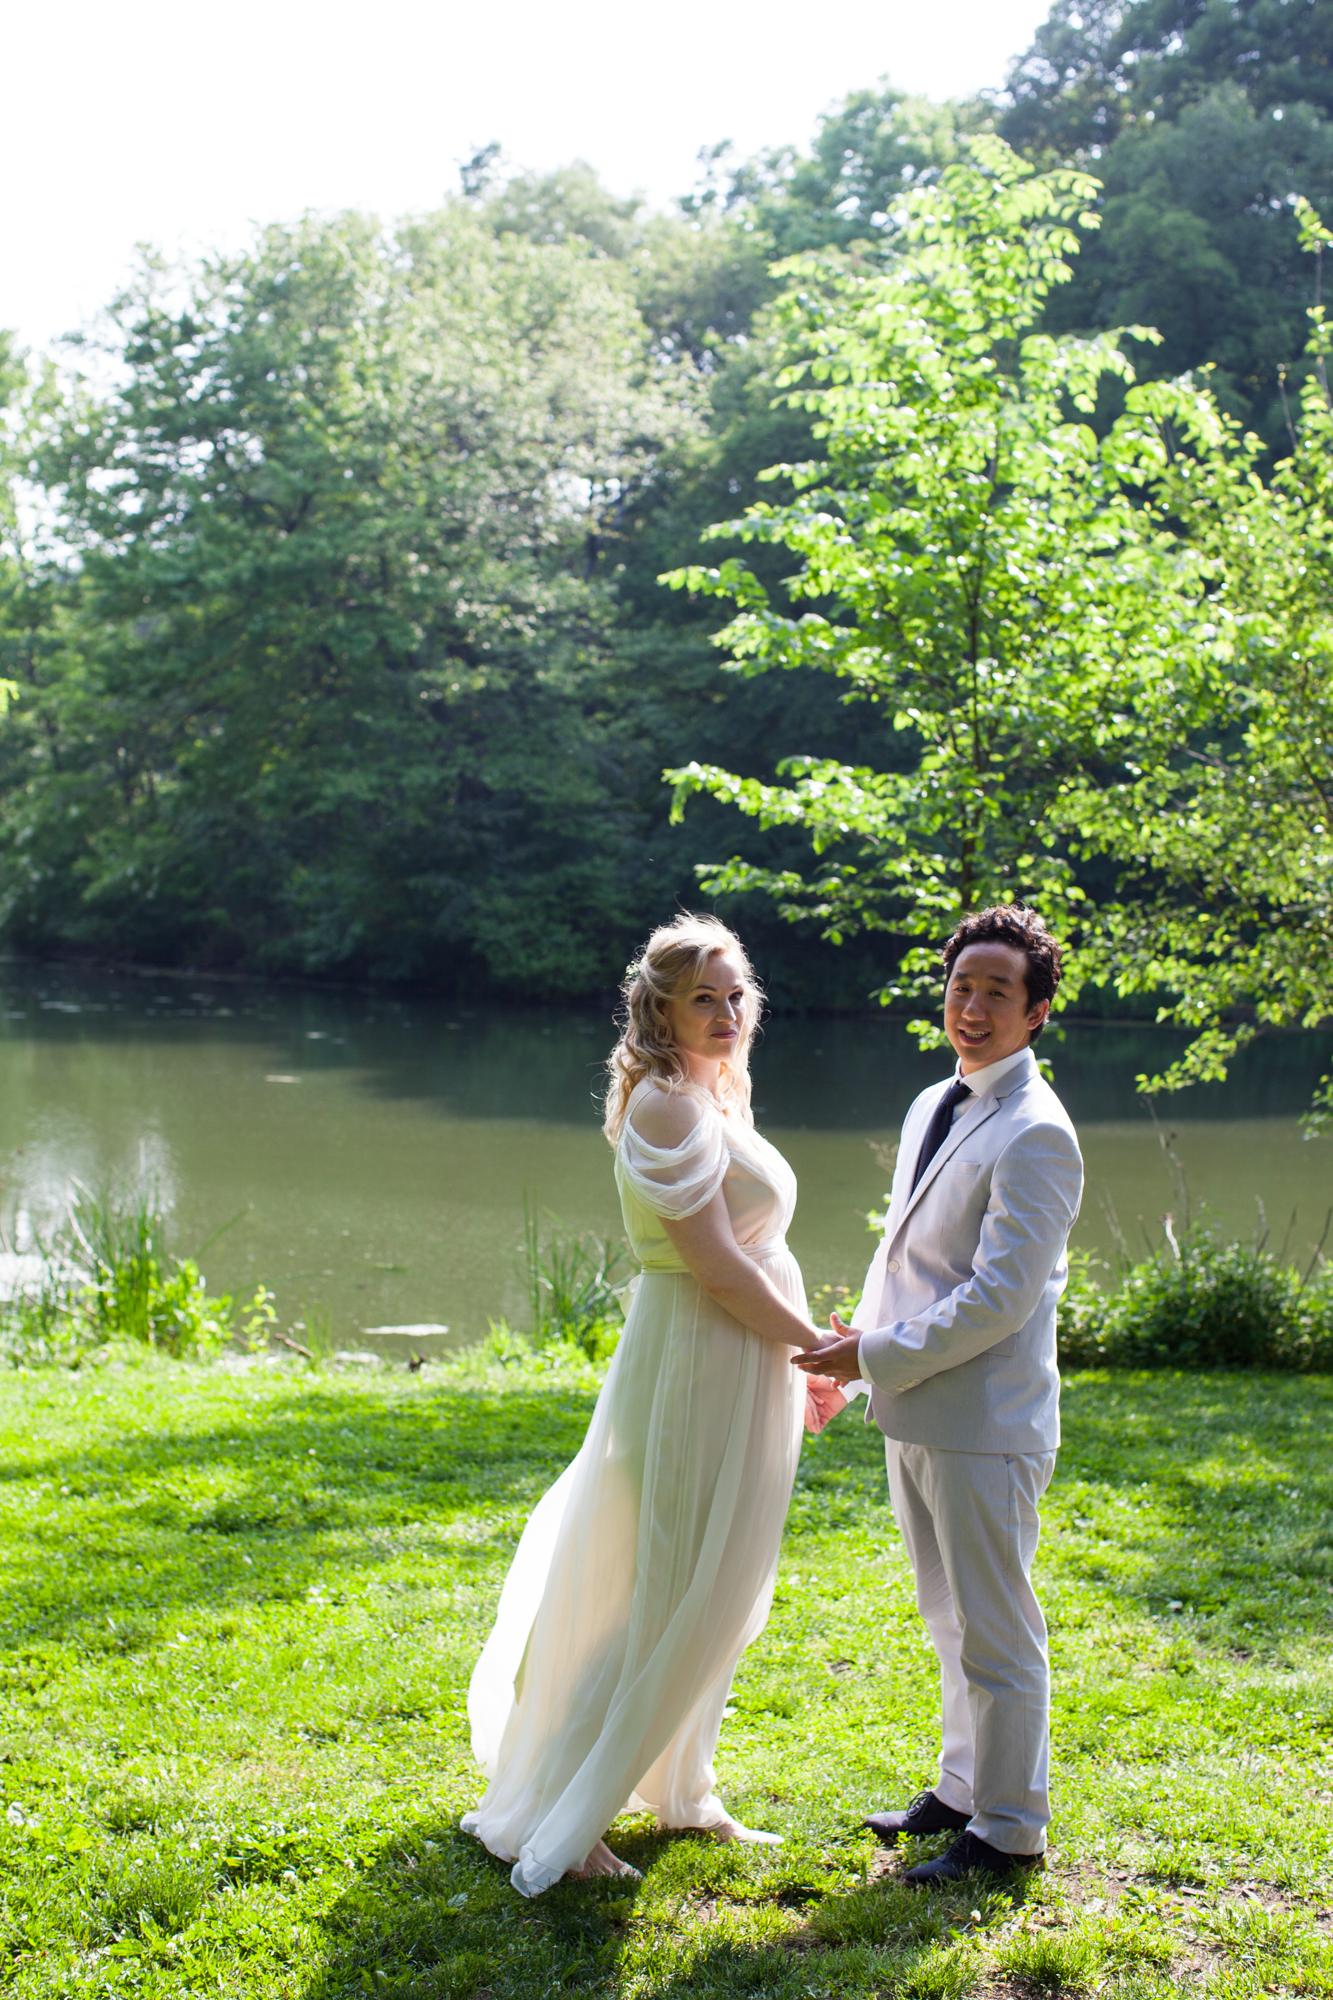 Picnic House Summer Wedding